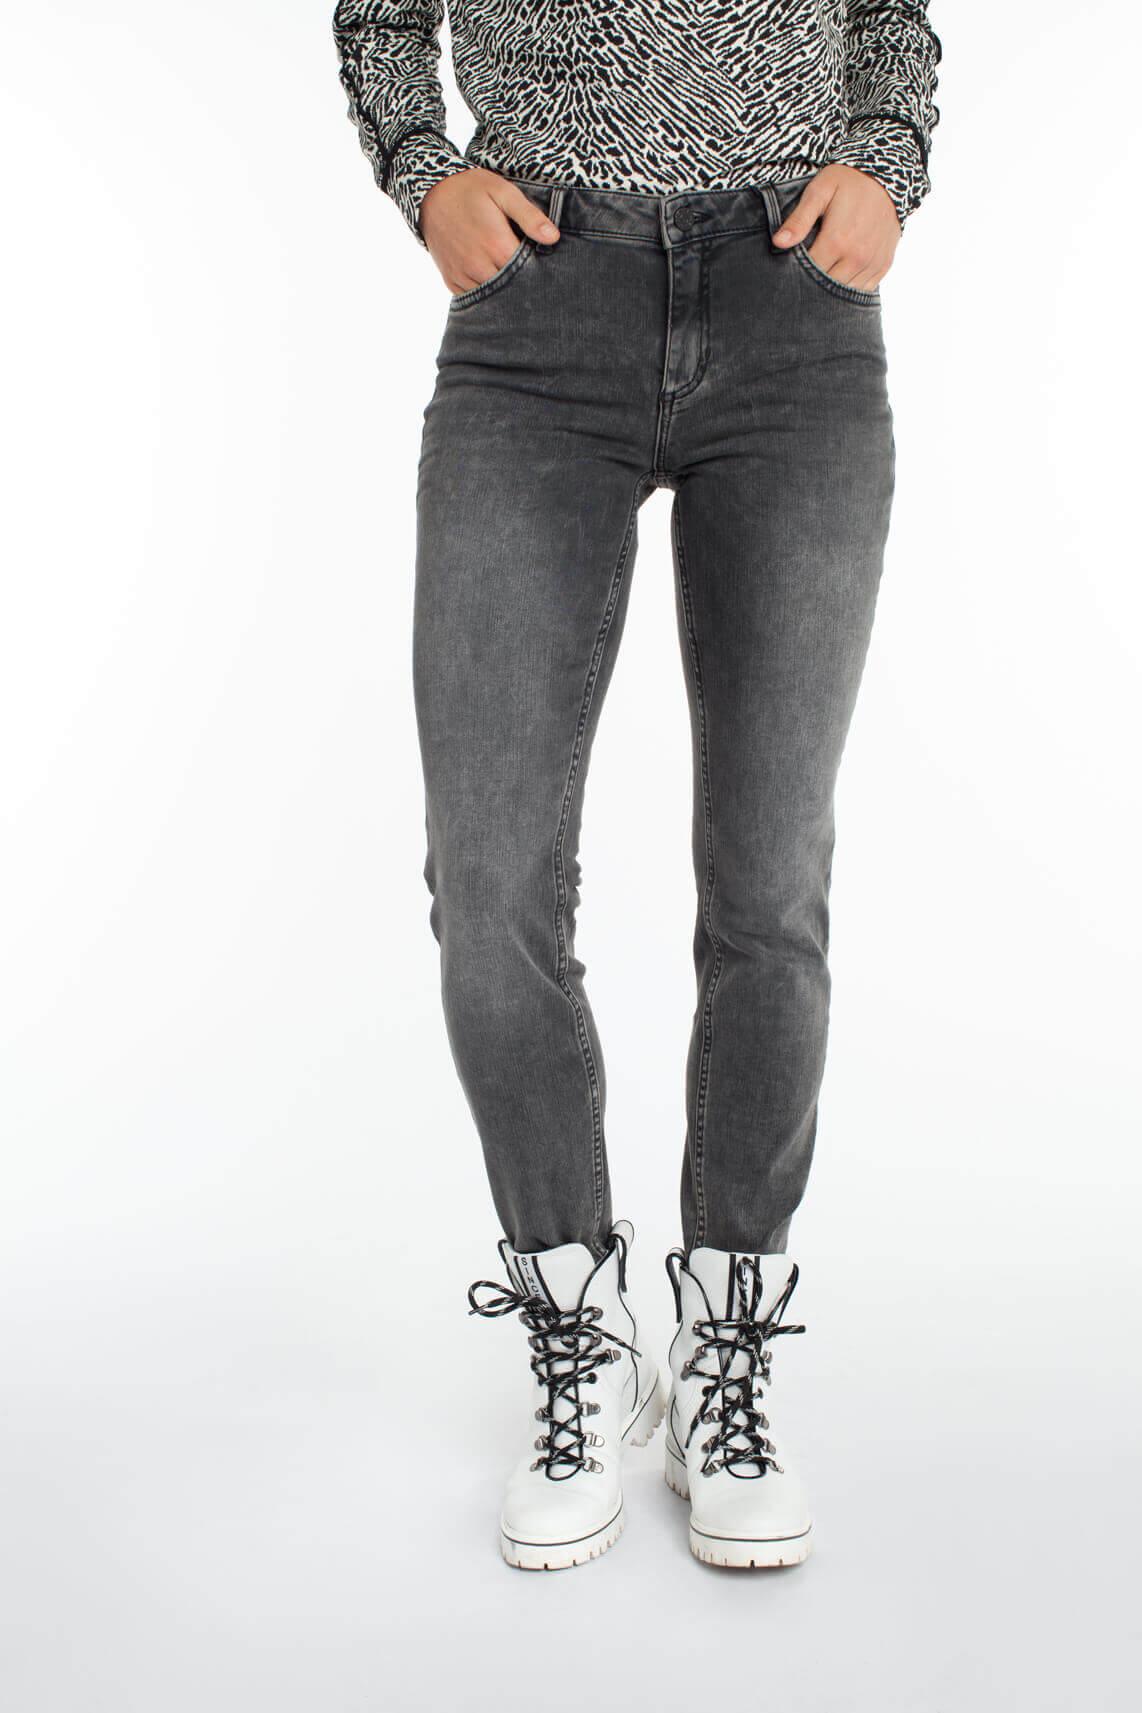 Rosner Dames Antonia garment dye skinny jeans Grijs